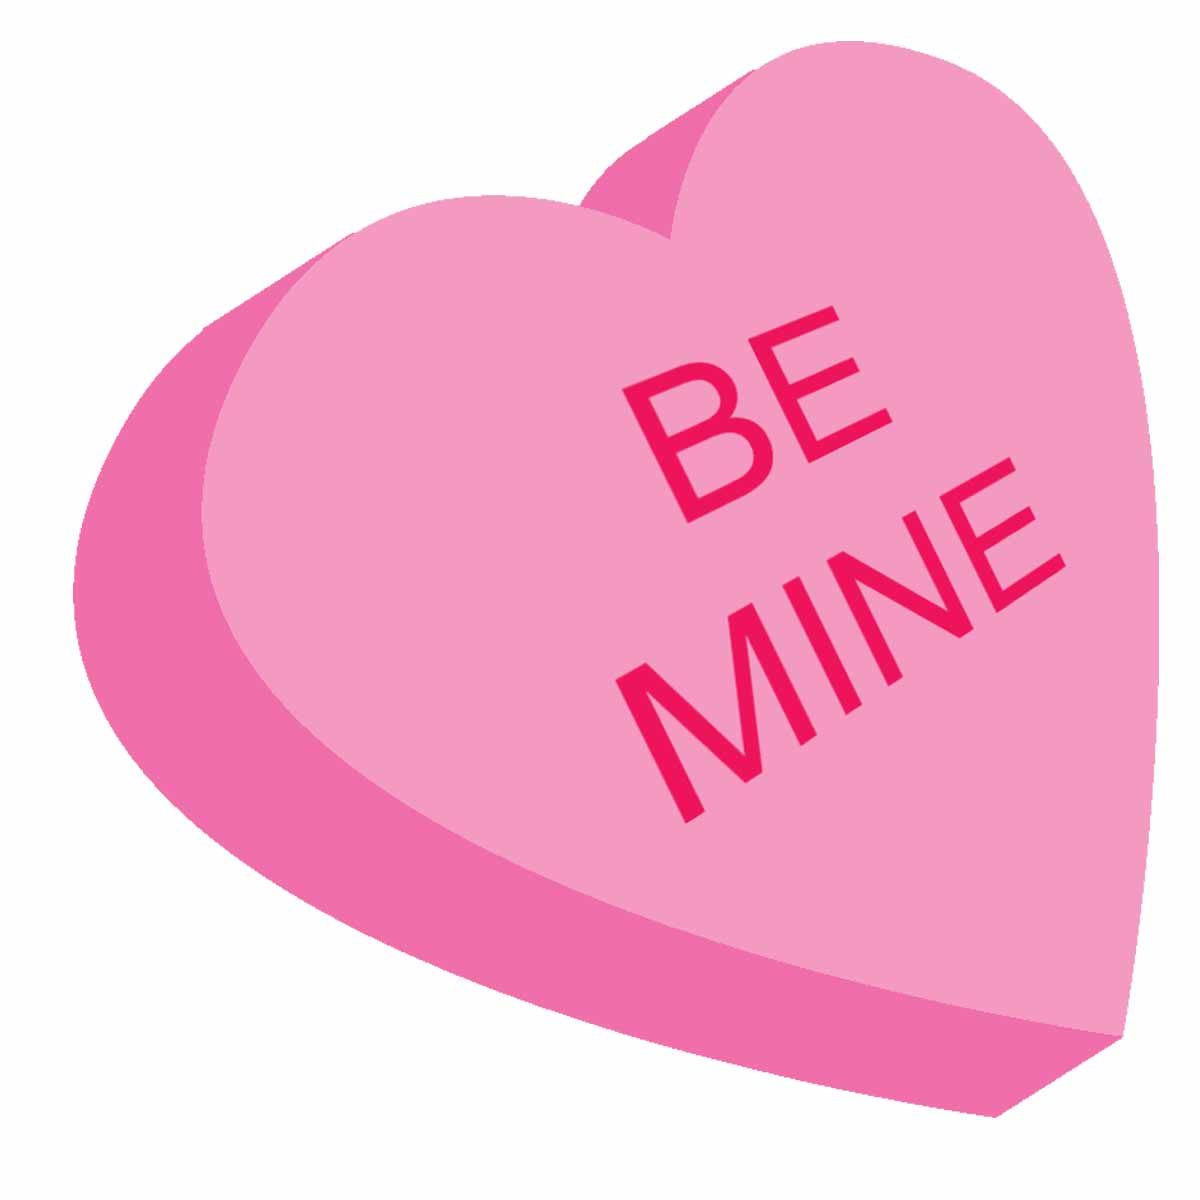 valentines day clip art #3